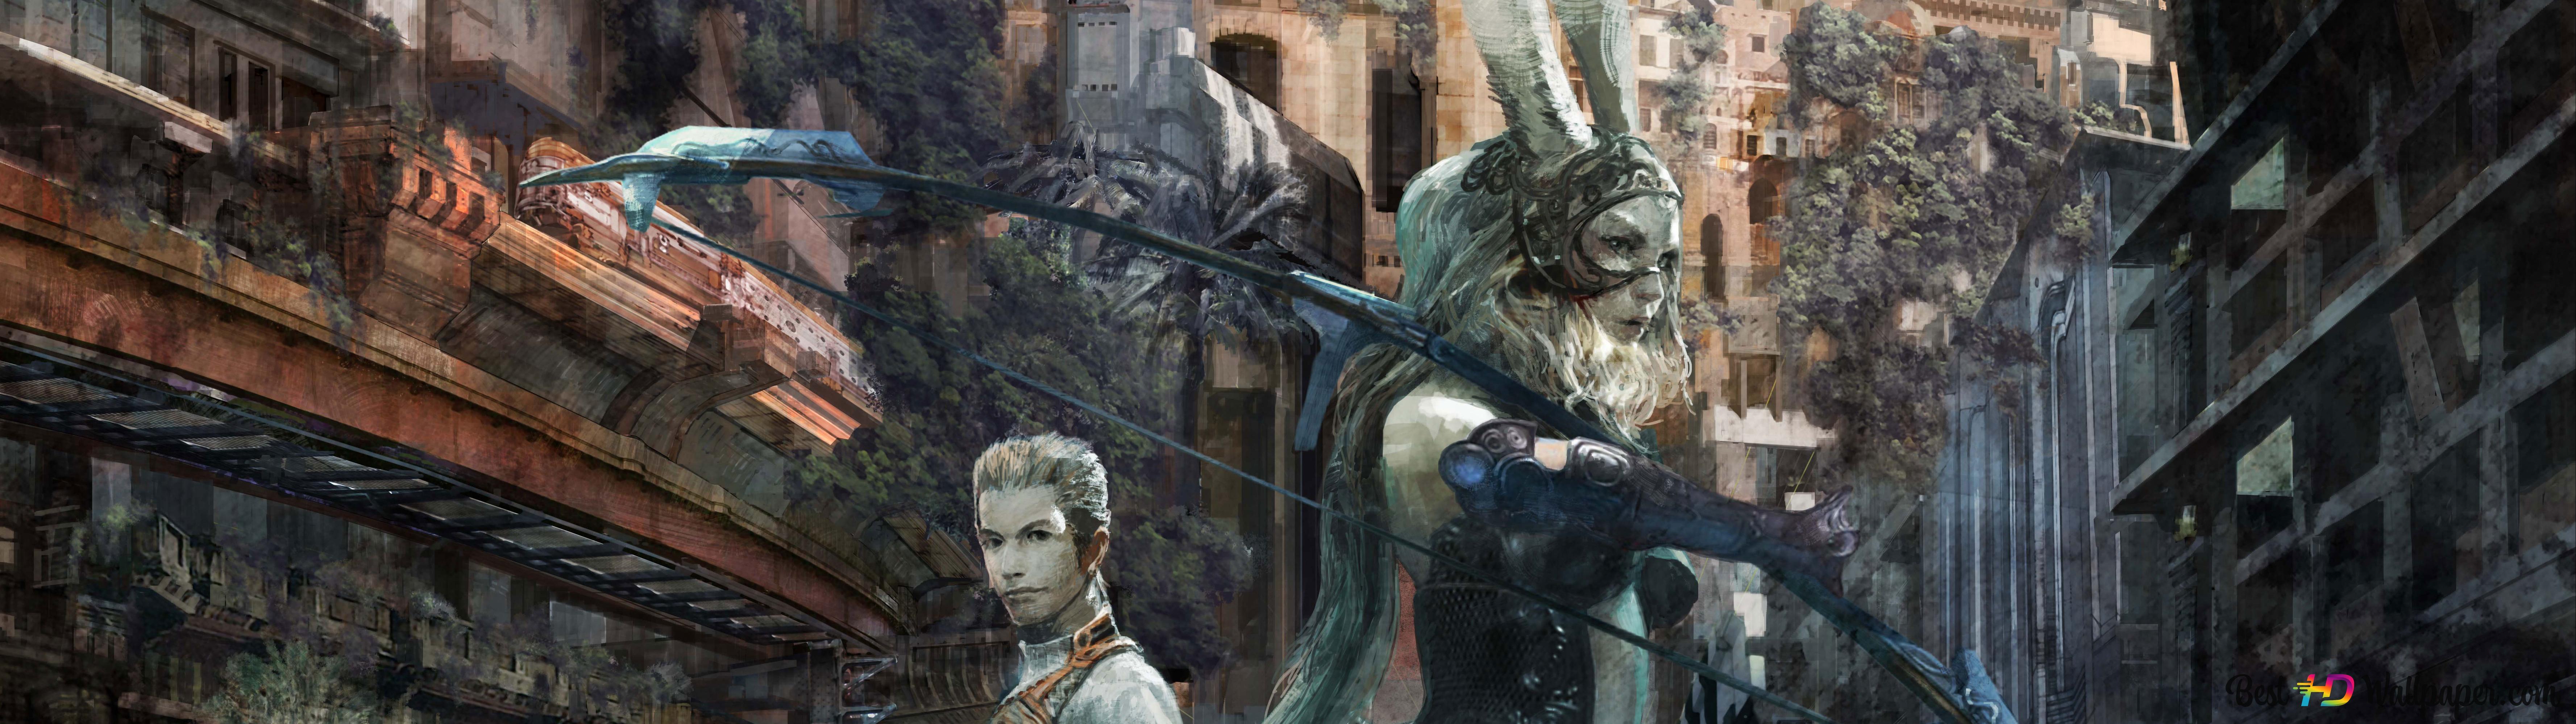 Final Fantasy Xii The Zodiac Age Hd Wallpaper Download